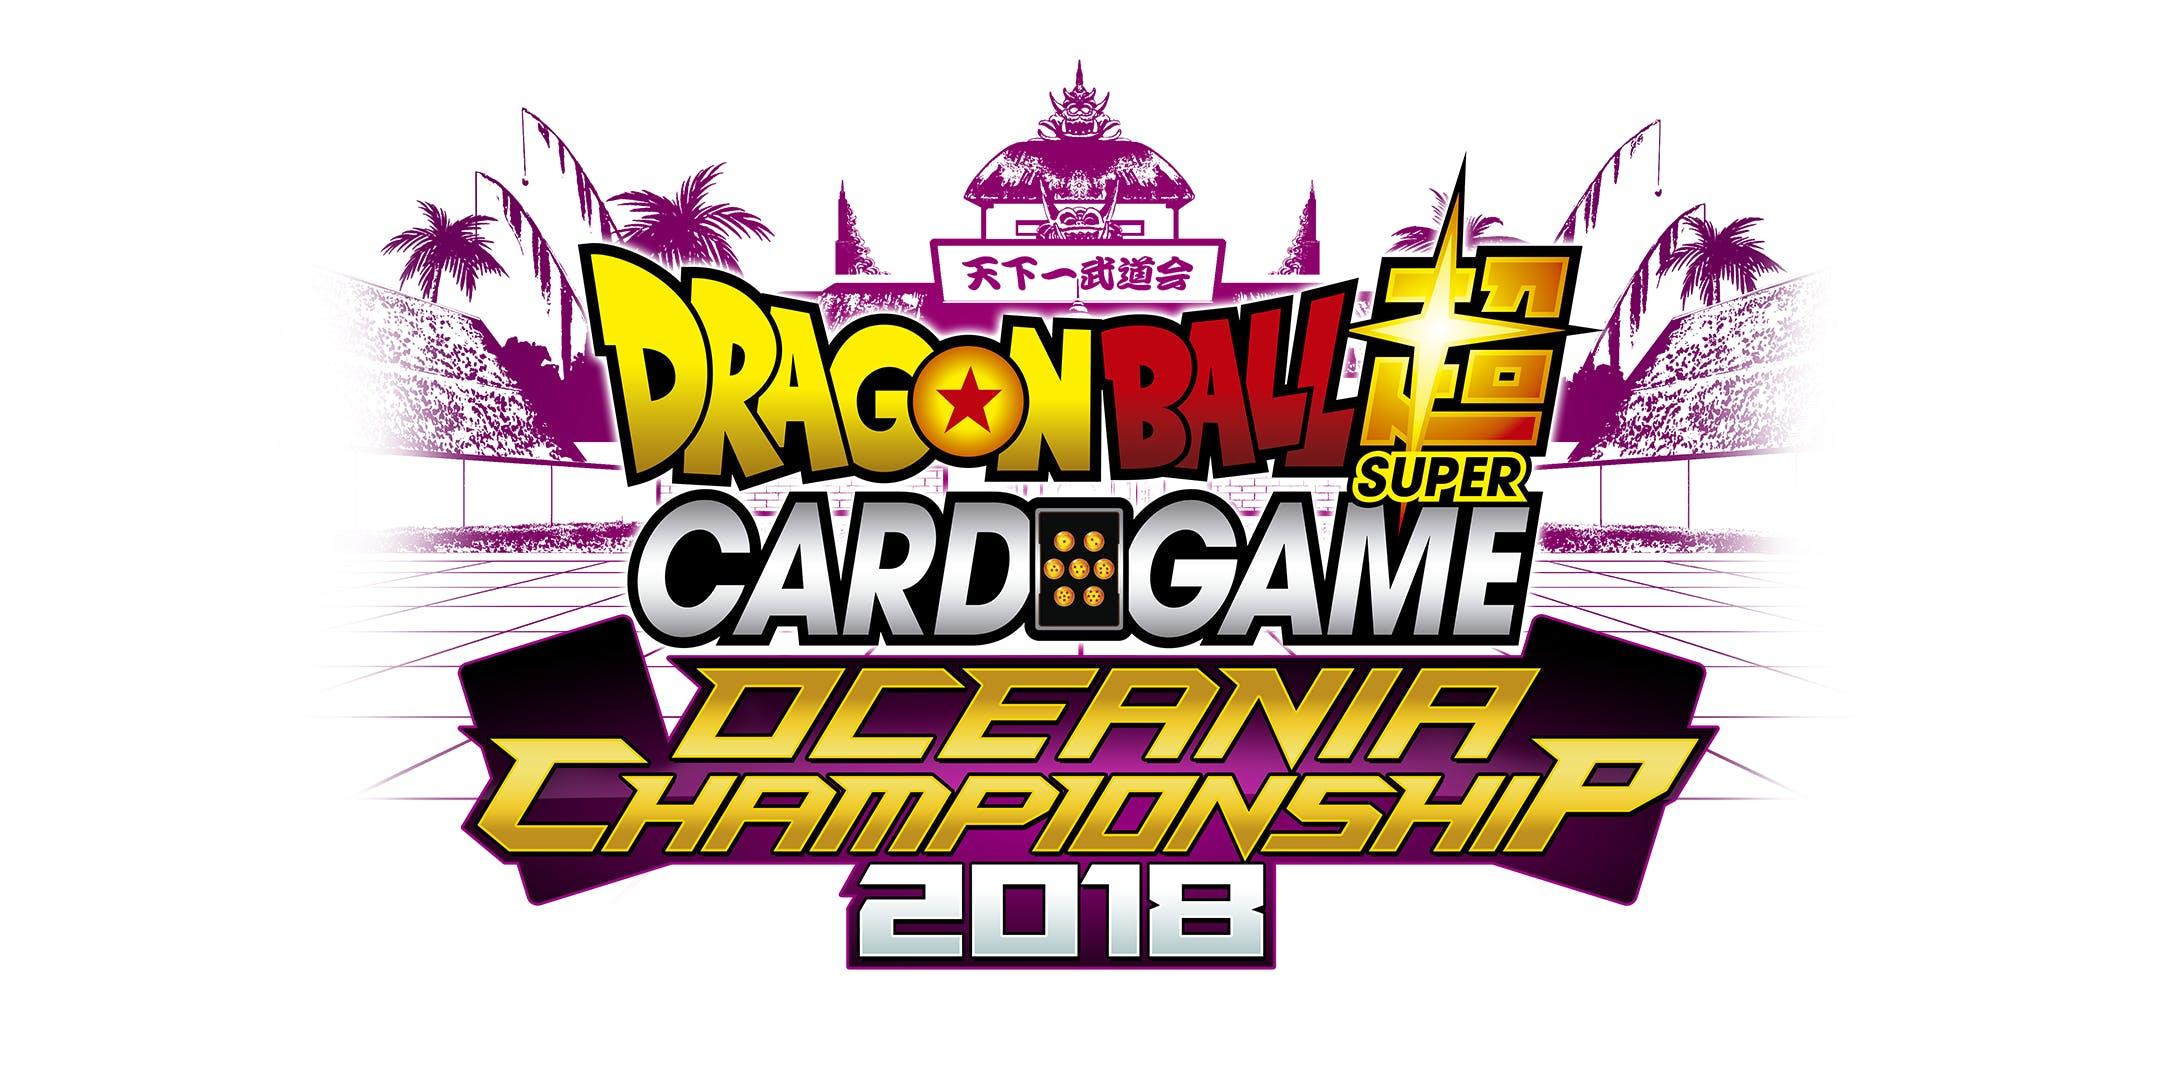 Dragon Ball Super Card Game - Oceania Regional - Adelaide SA